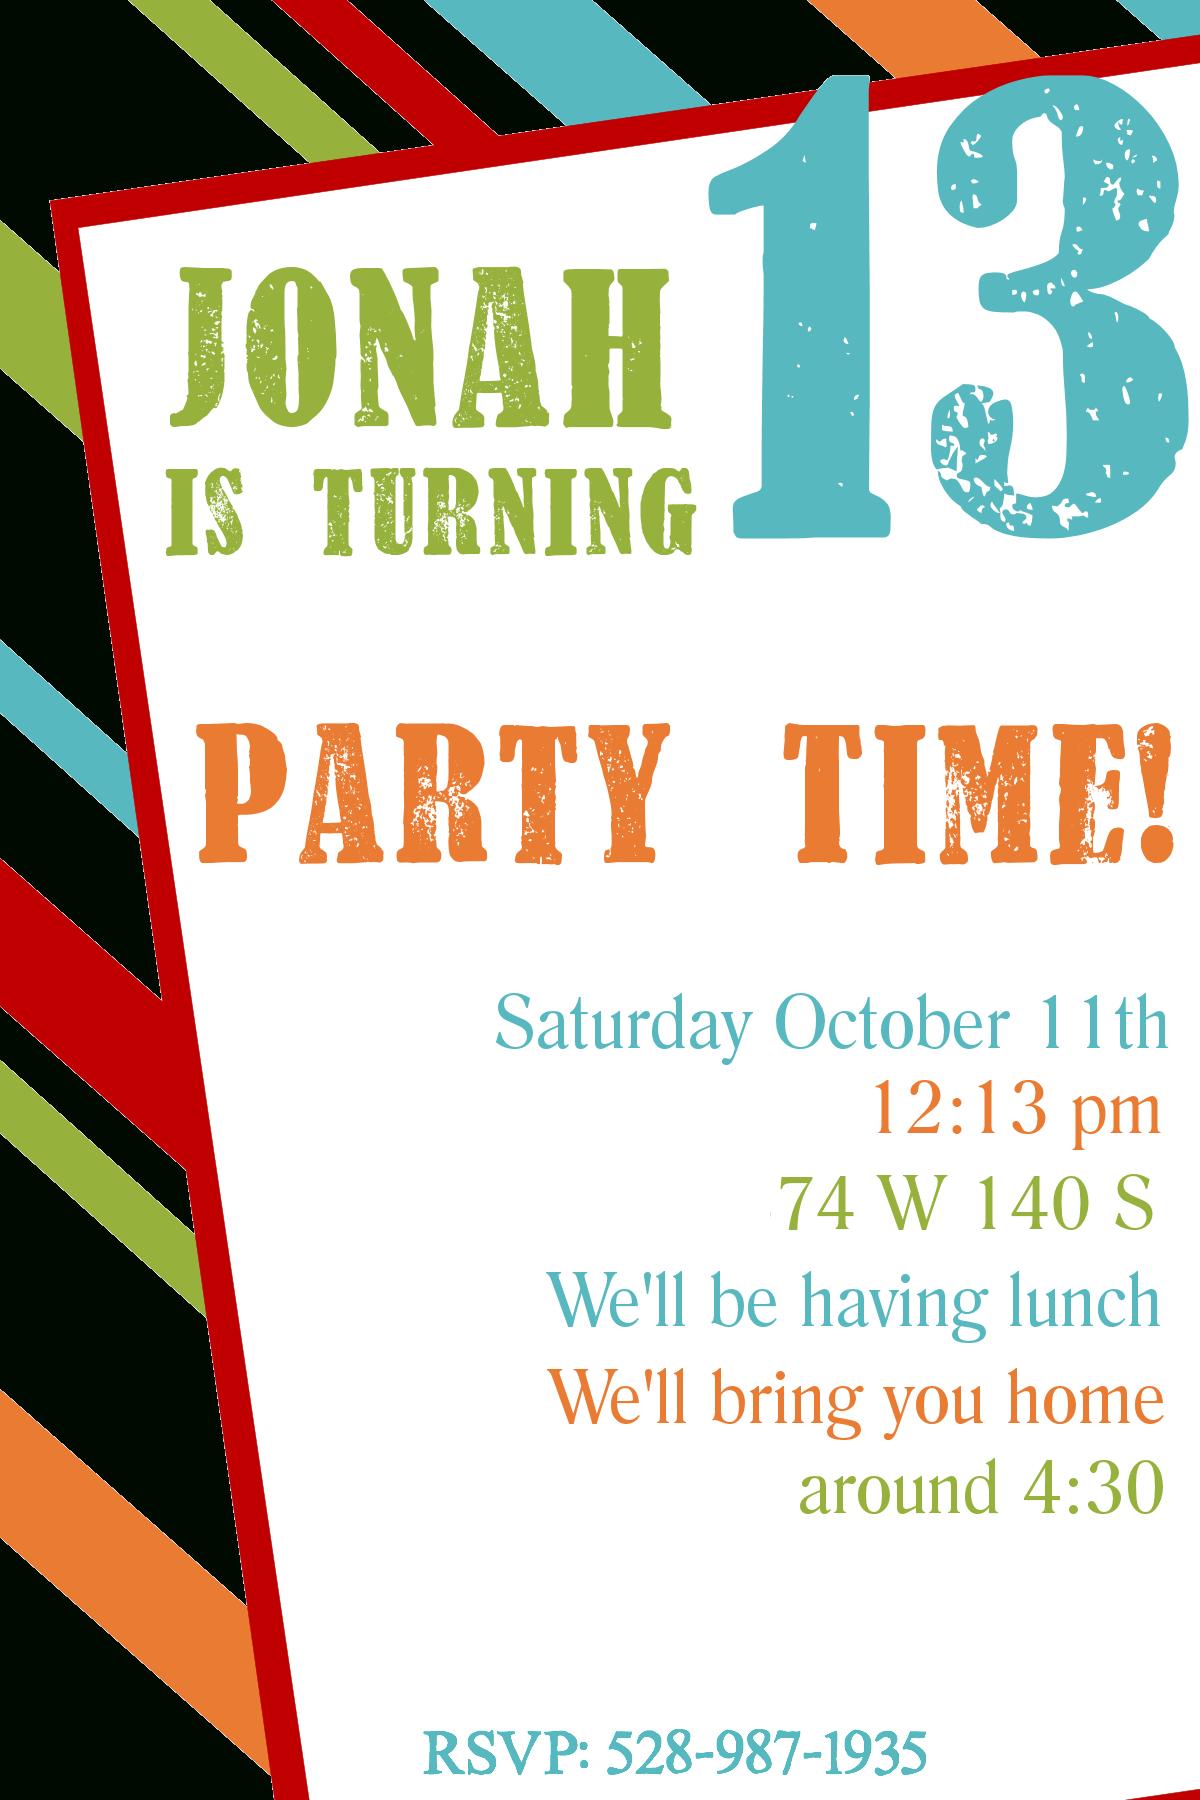 Free Printable Birthday Invitation Templates - Free Printable Invitations Templates